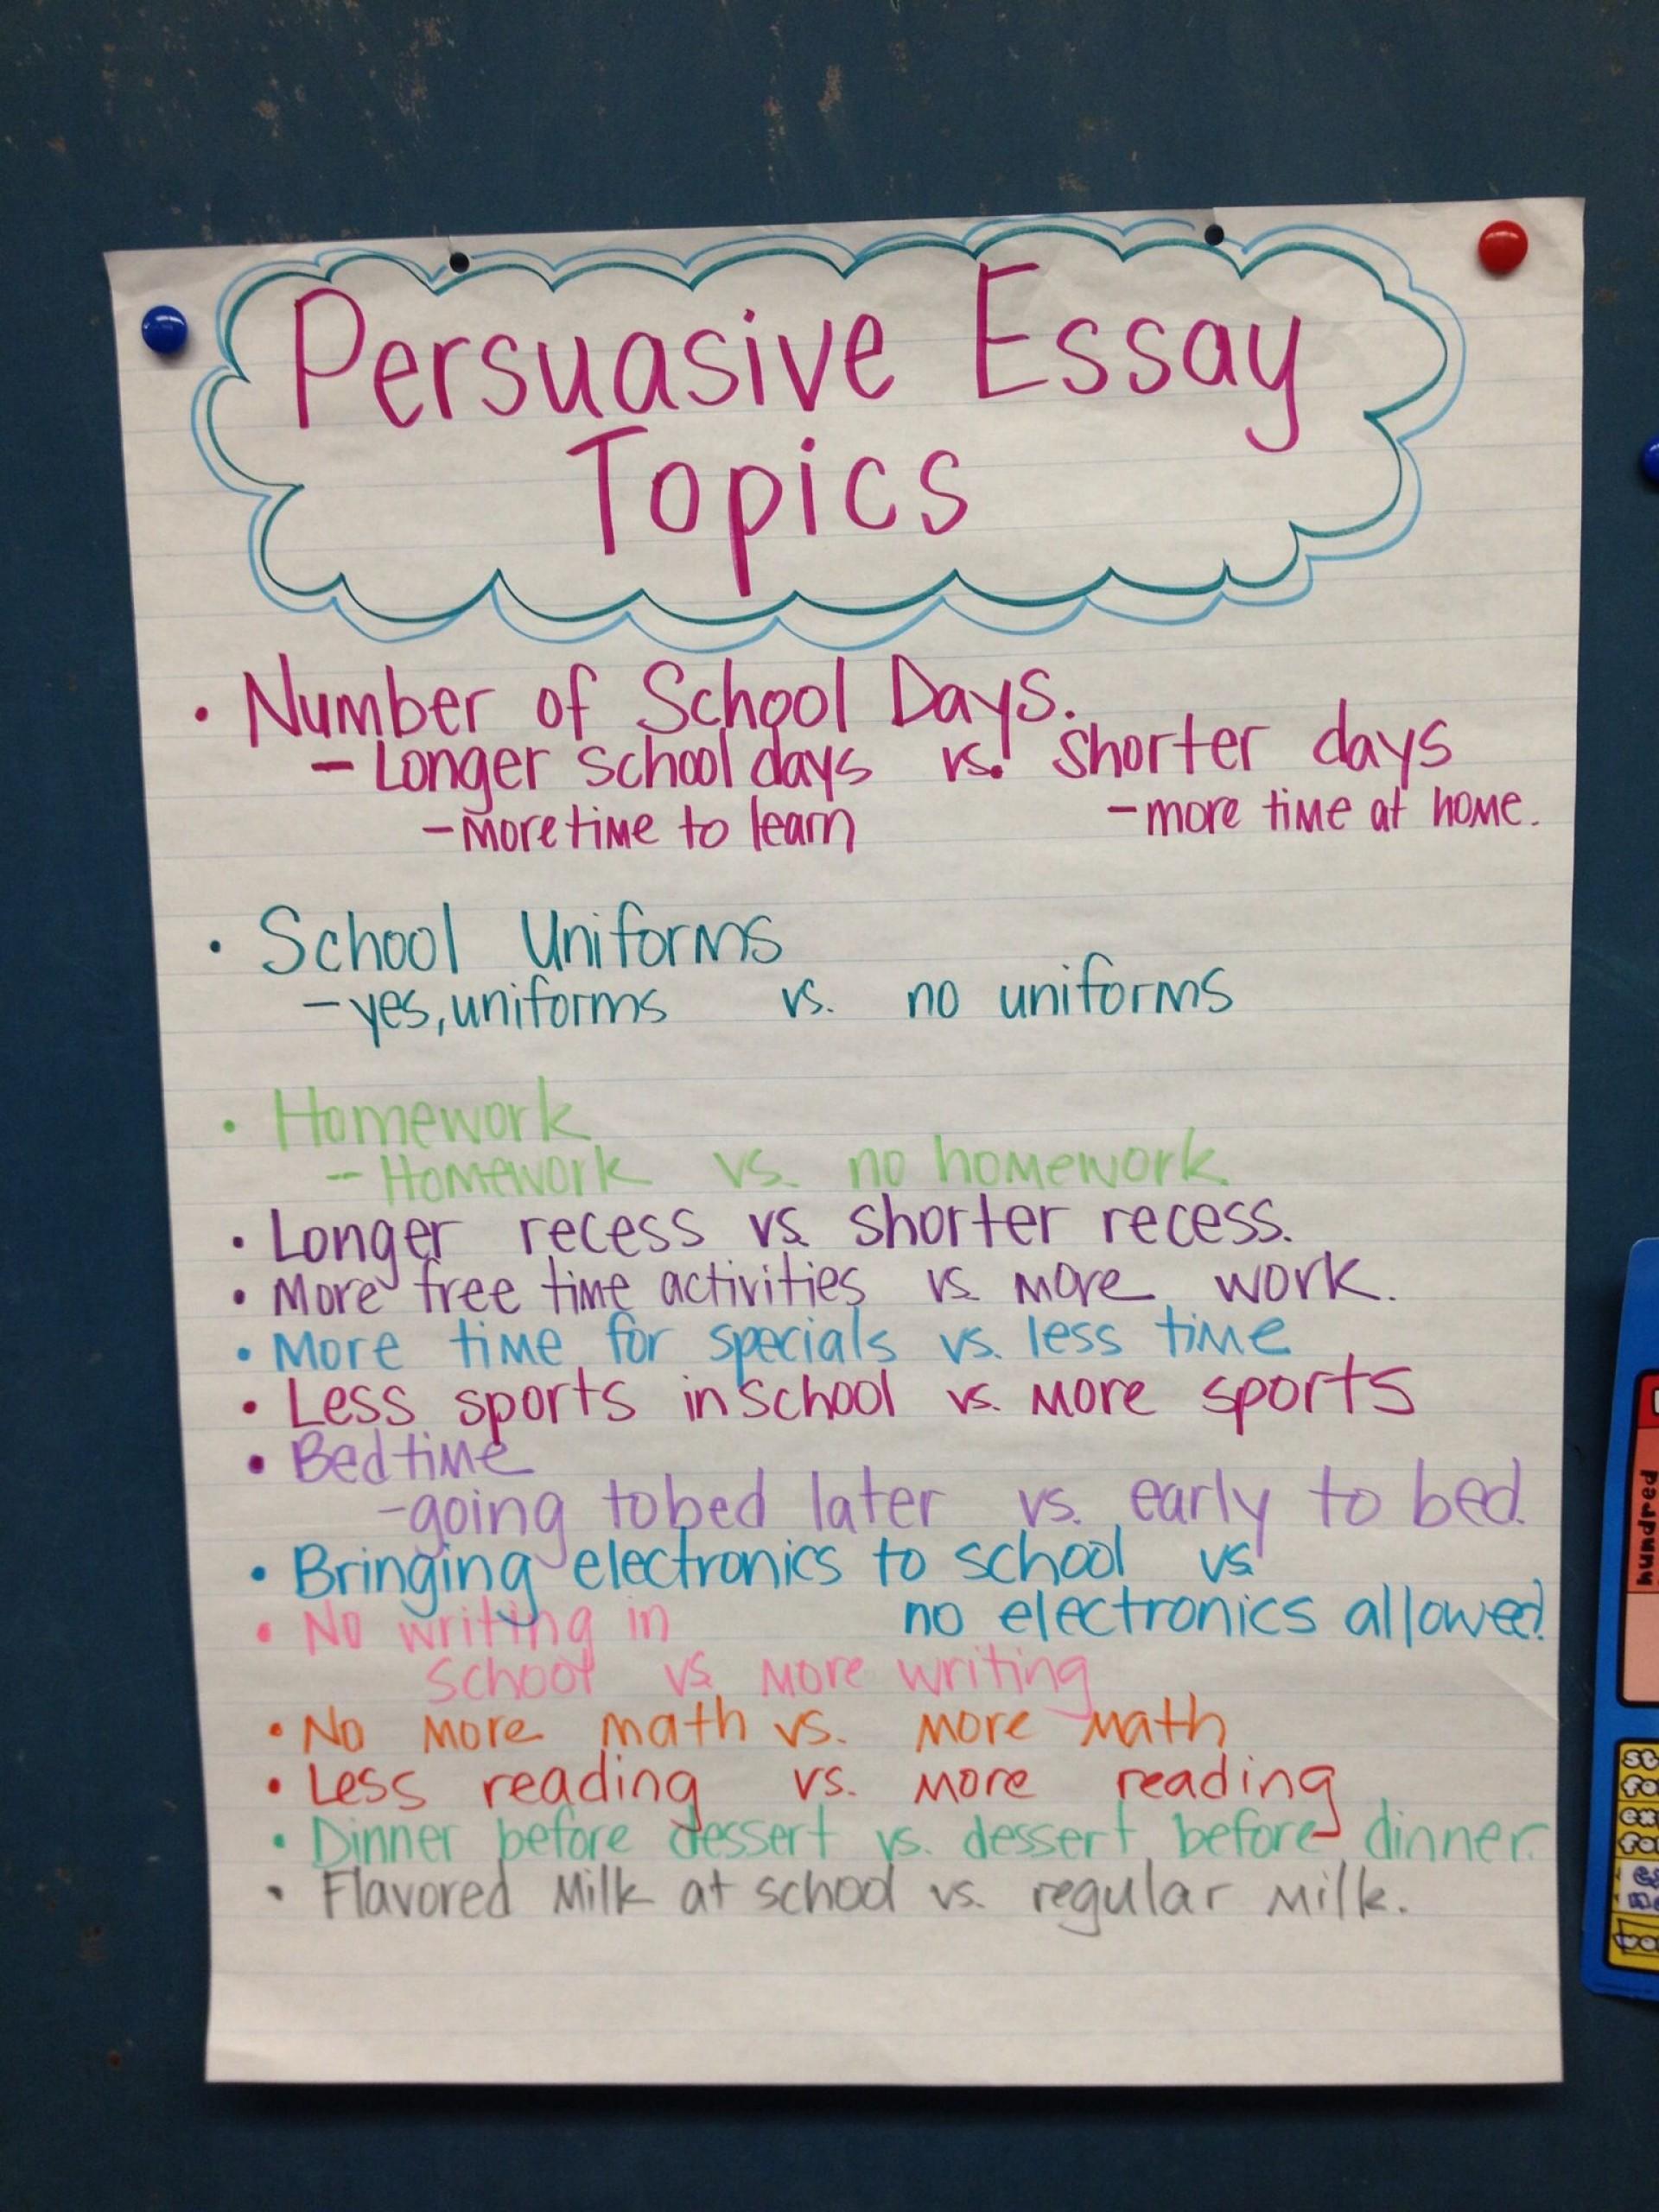 003 Ideas For Persuasive Essays Essay Example Stunning High School 4th Grade Uk 1920